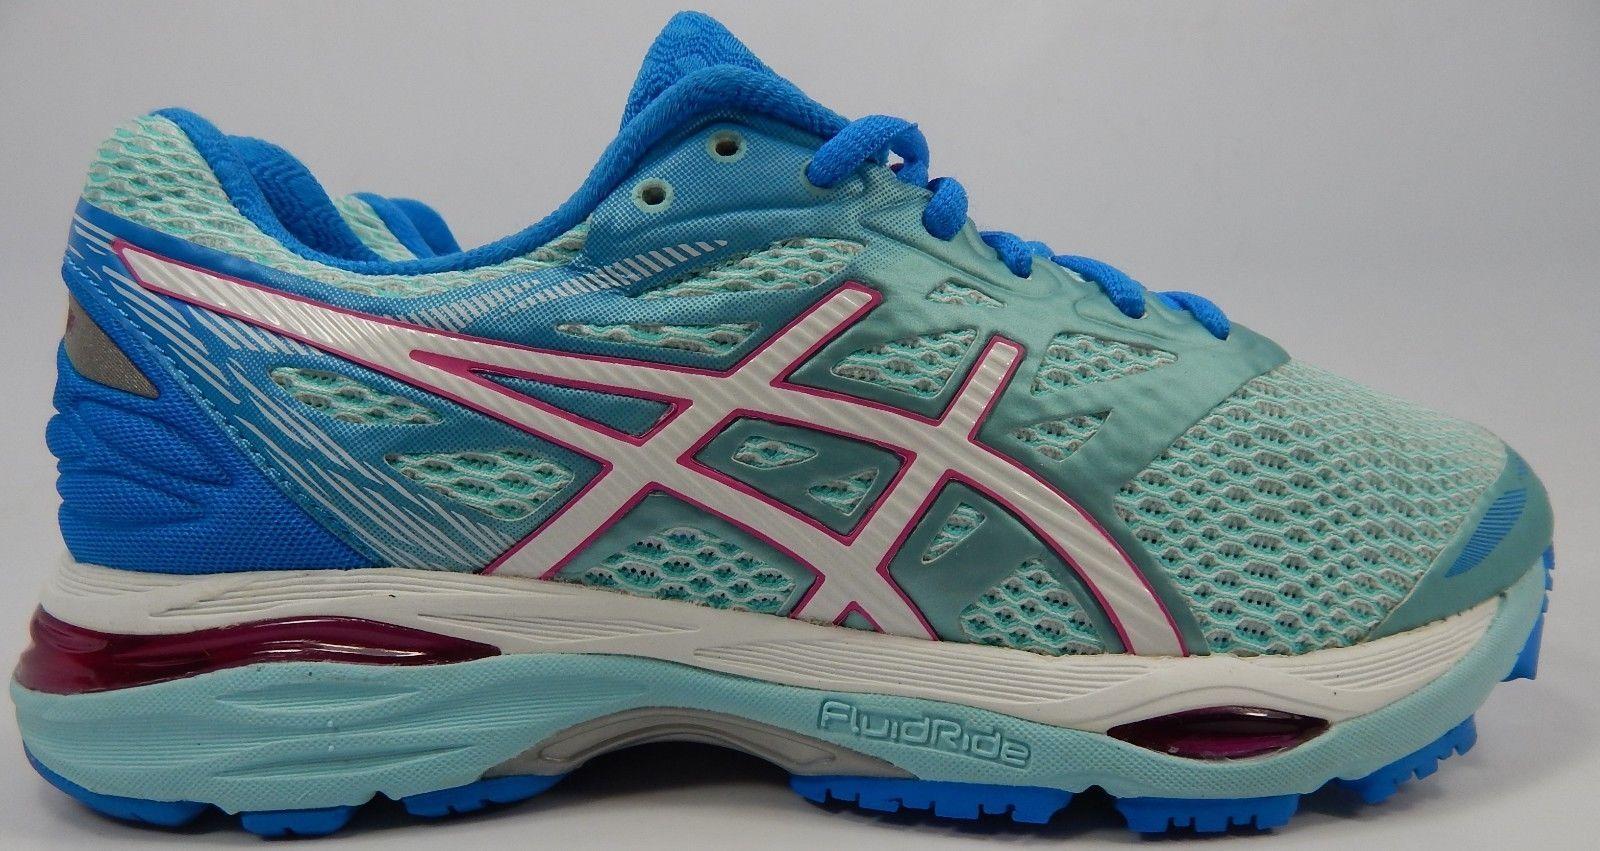 Asics Gel Cumulus 18 Size US 7 M (B) EU 38 Women's Running Shoes Blue T6C8N